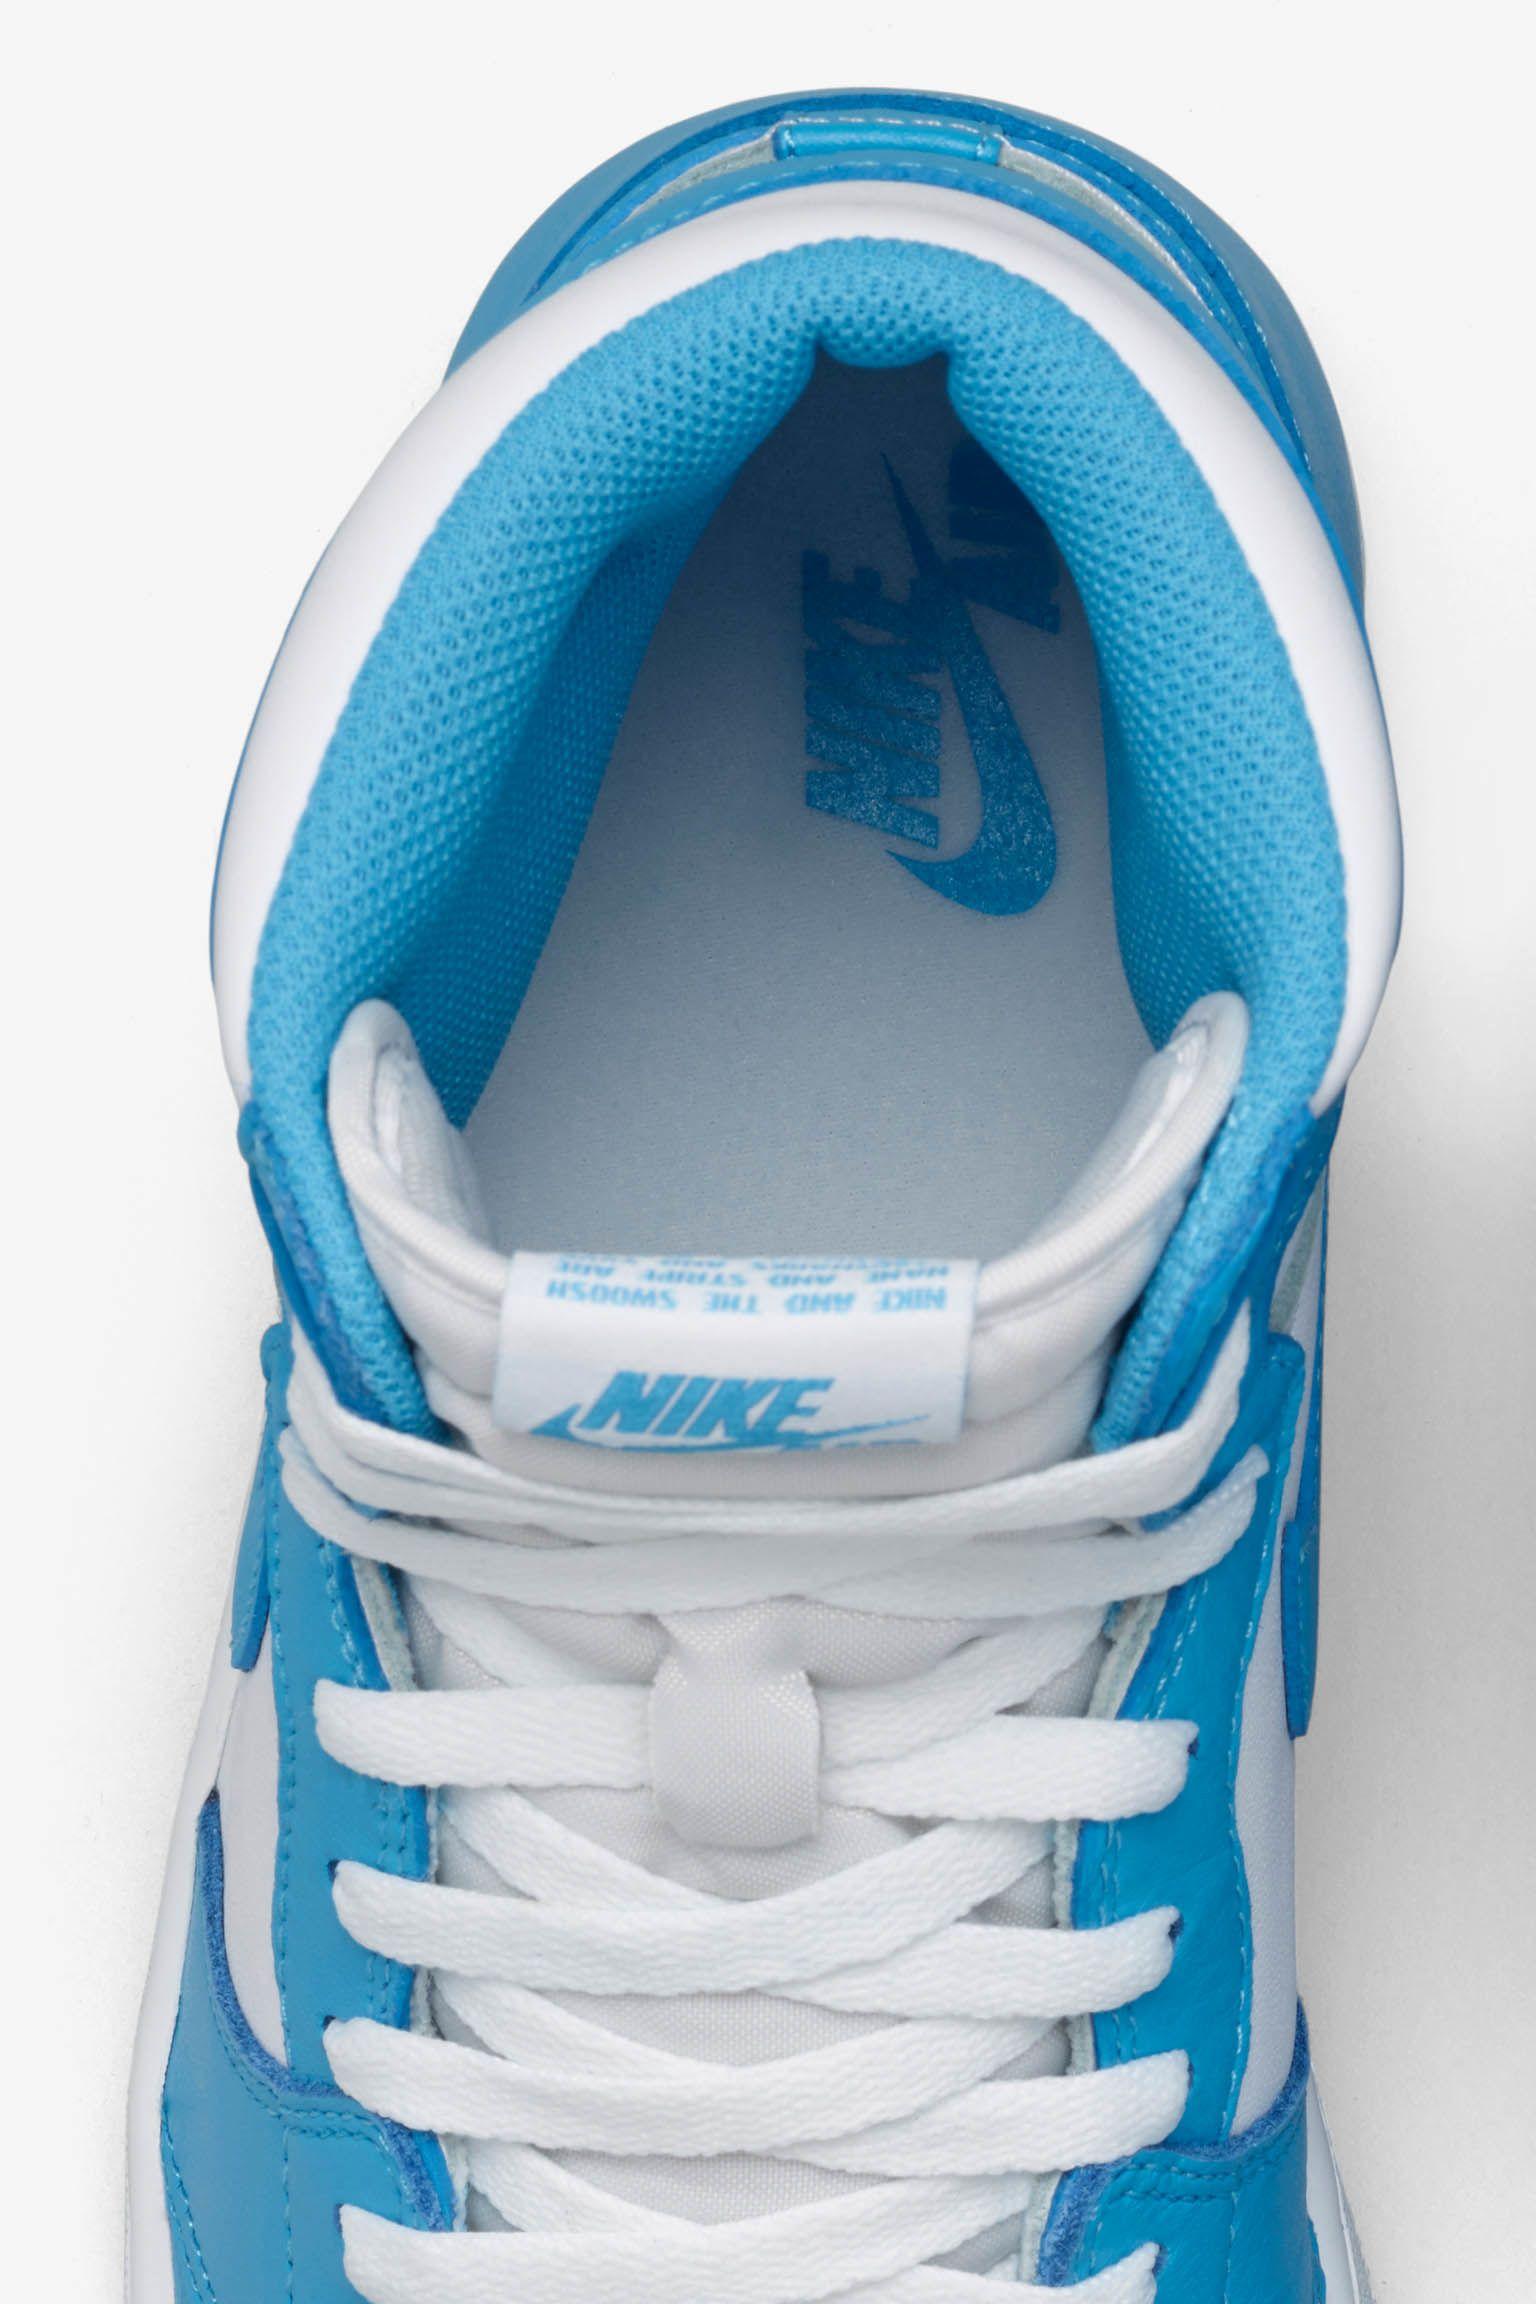 Air Jordan 1 Retro 'Powder Blue' Release Date